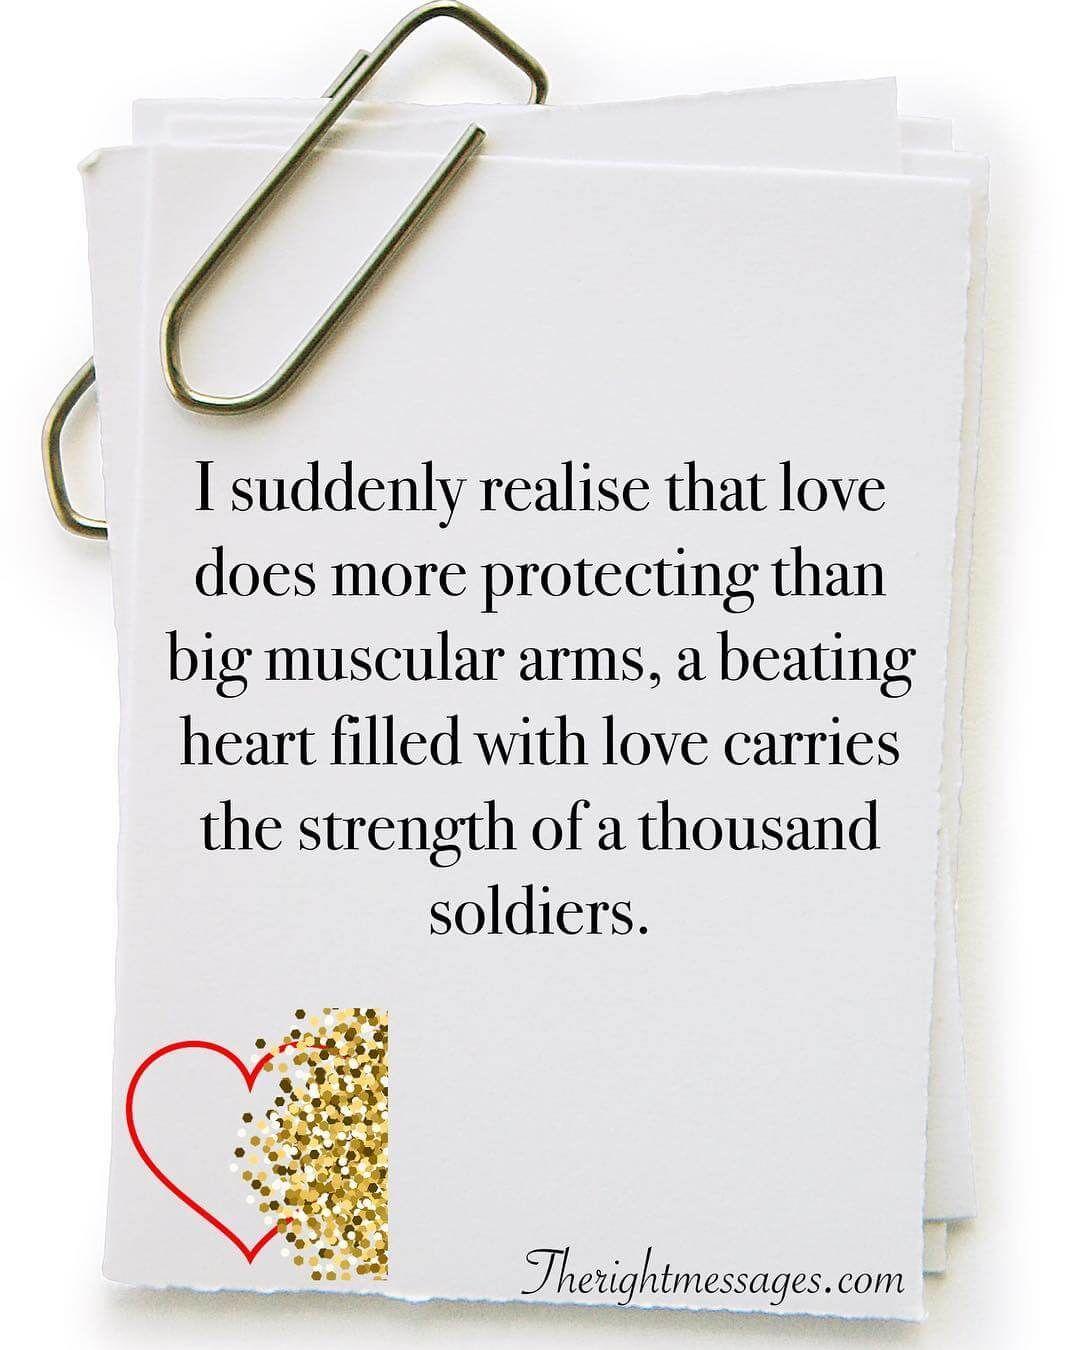 Thousand arms dating advice